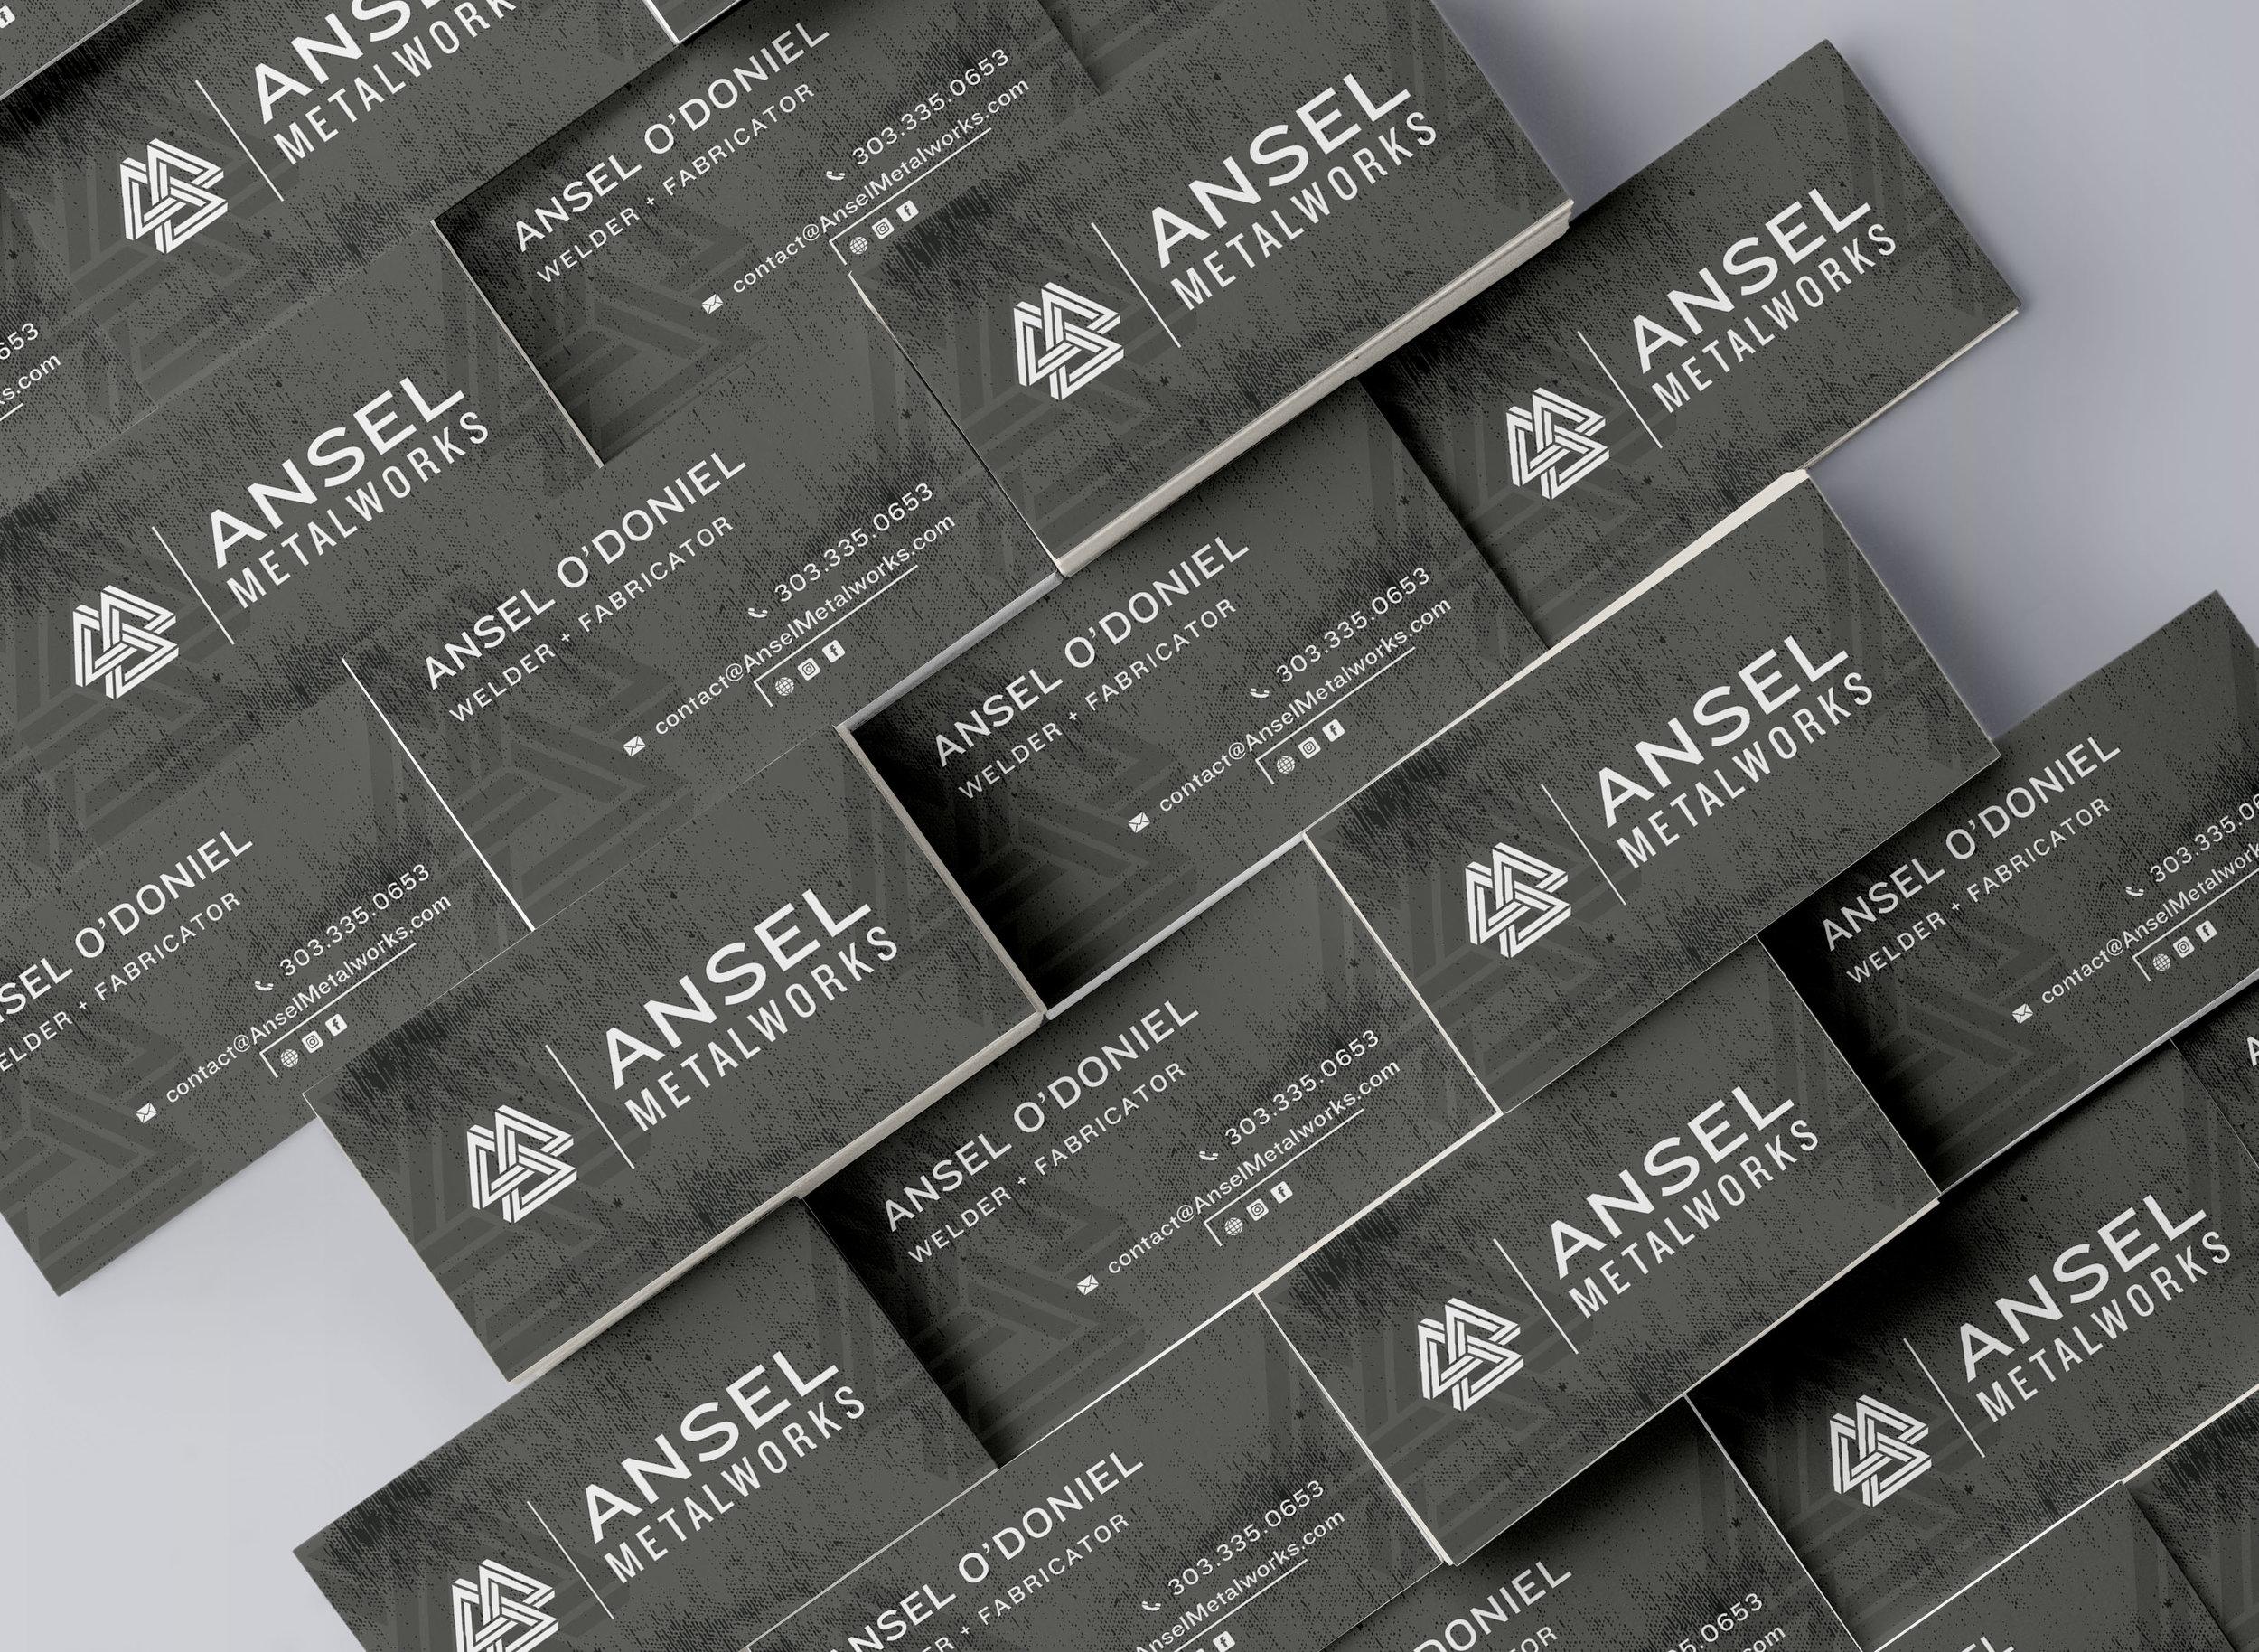 AnselCardSite-2.jpg